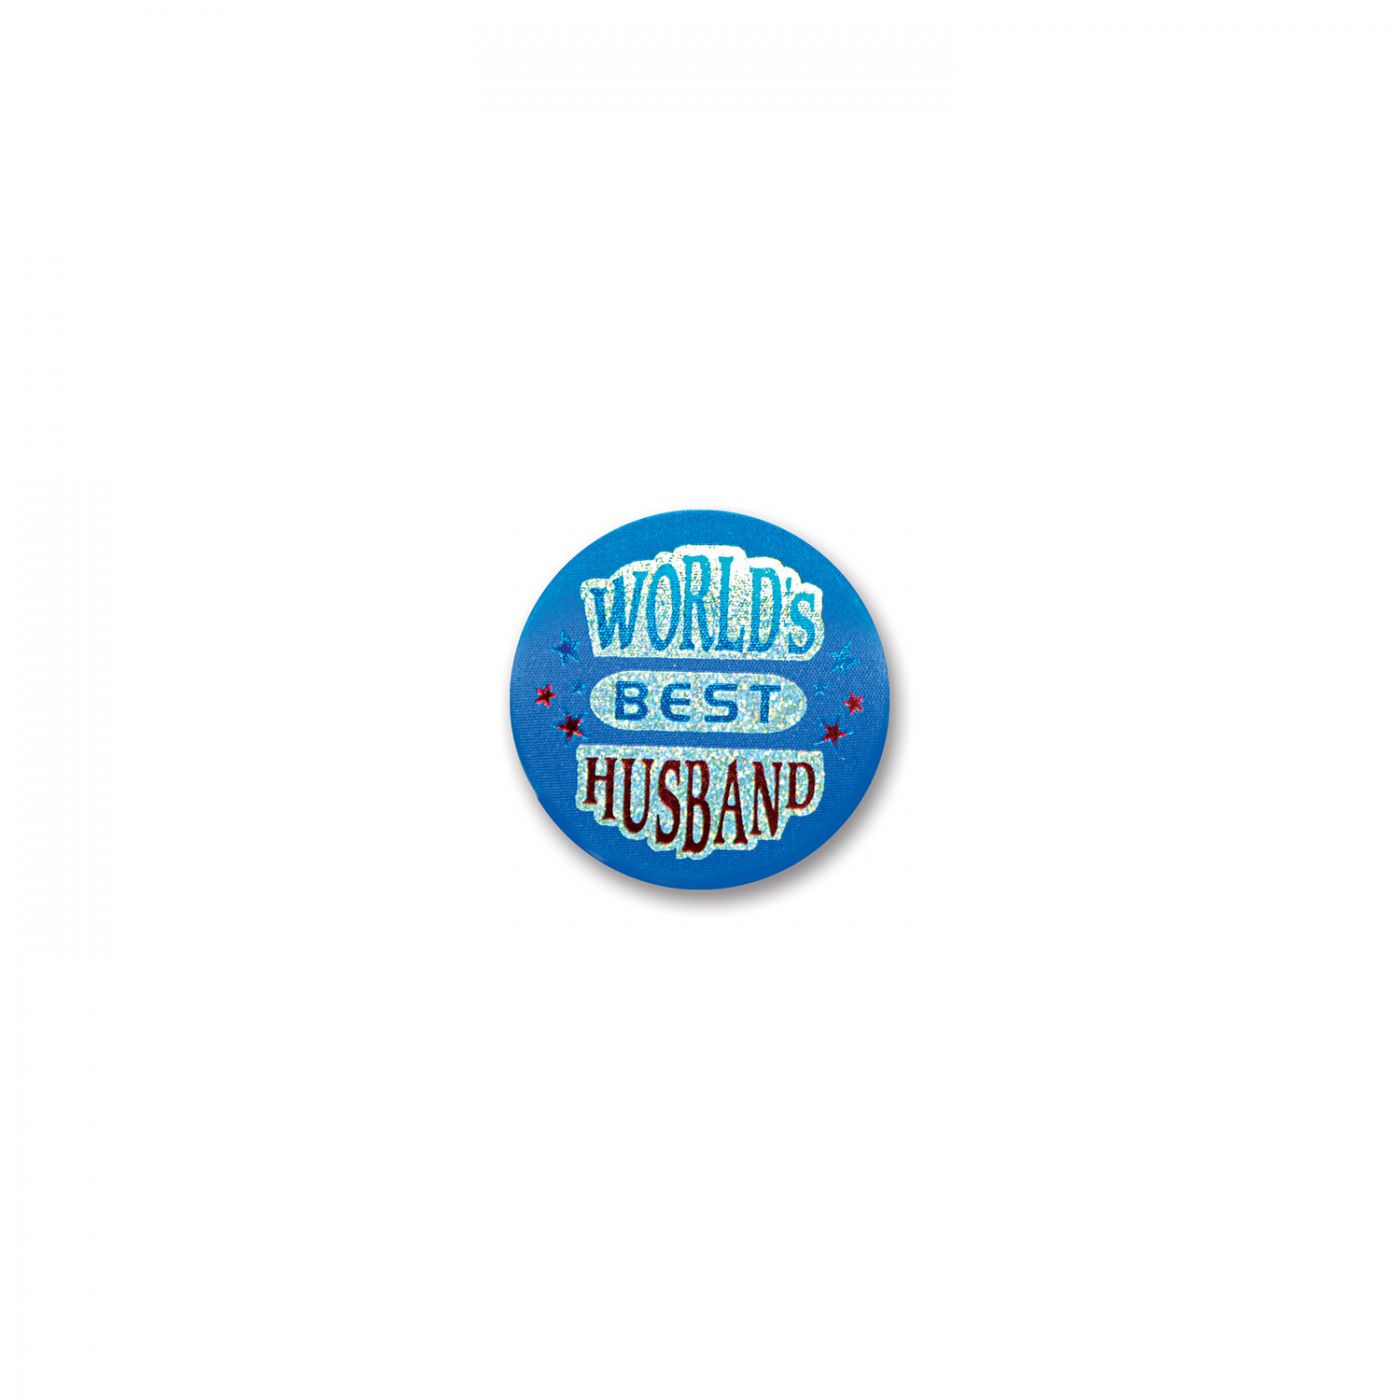 World's Best Husband Satin Button (6) image